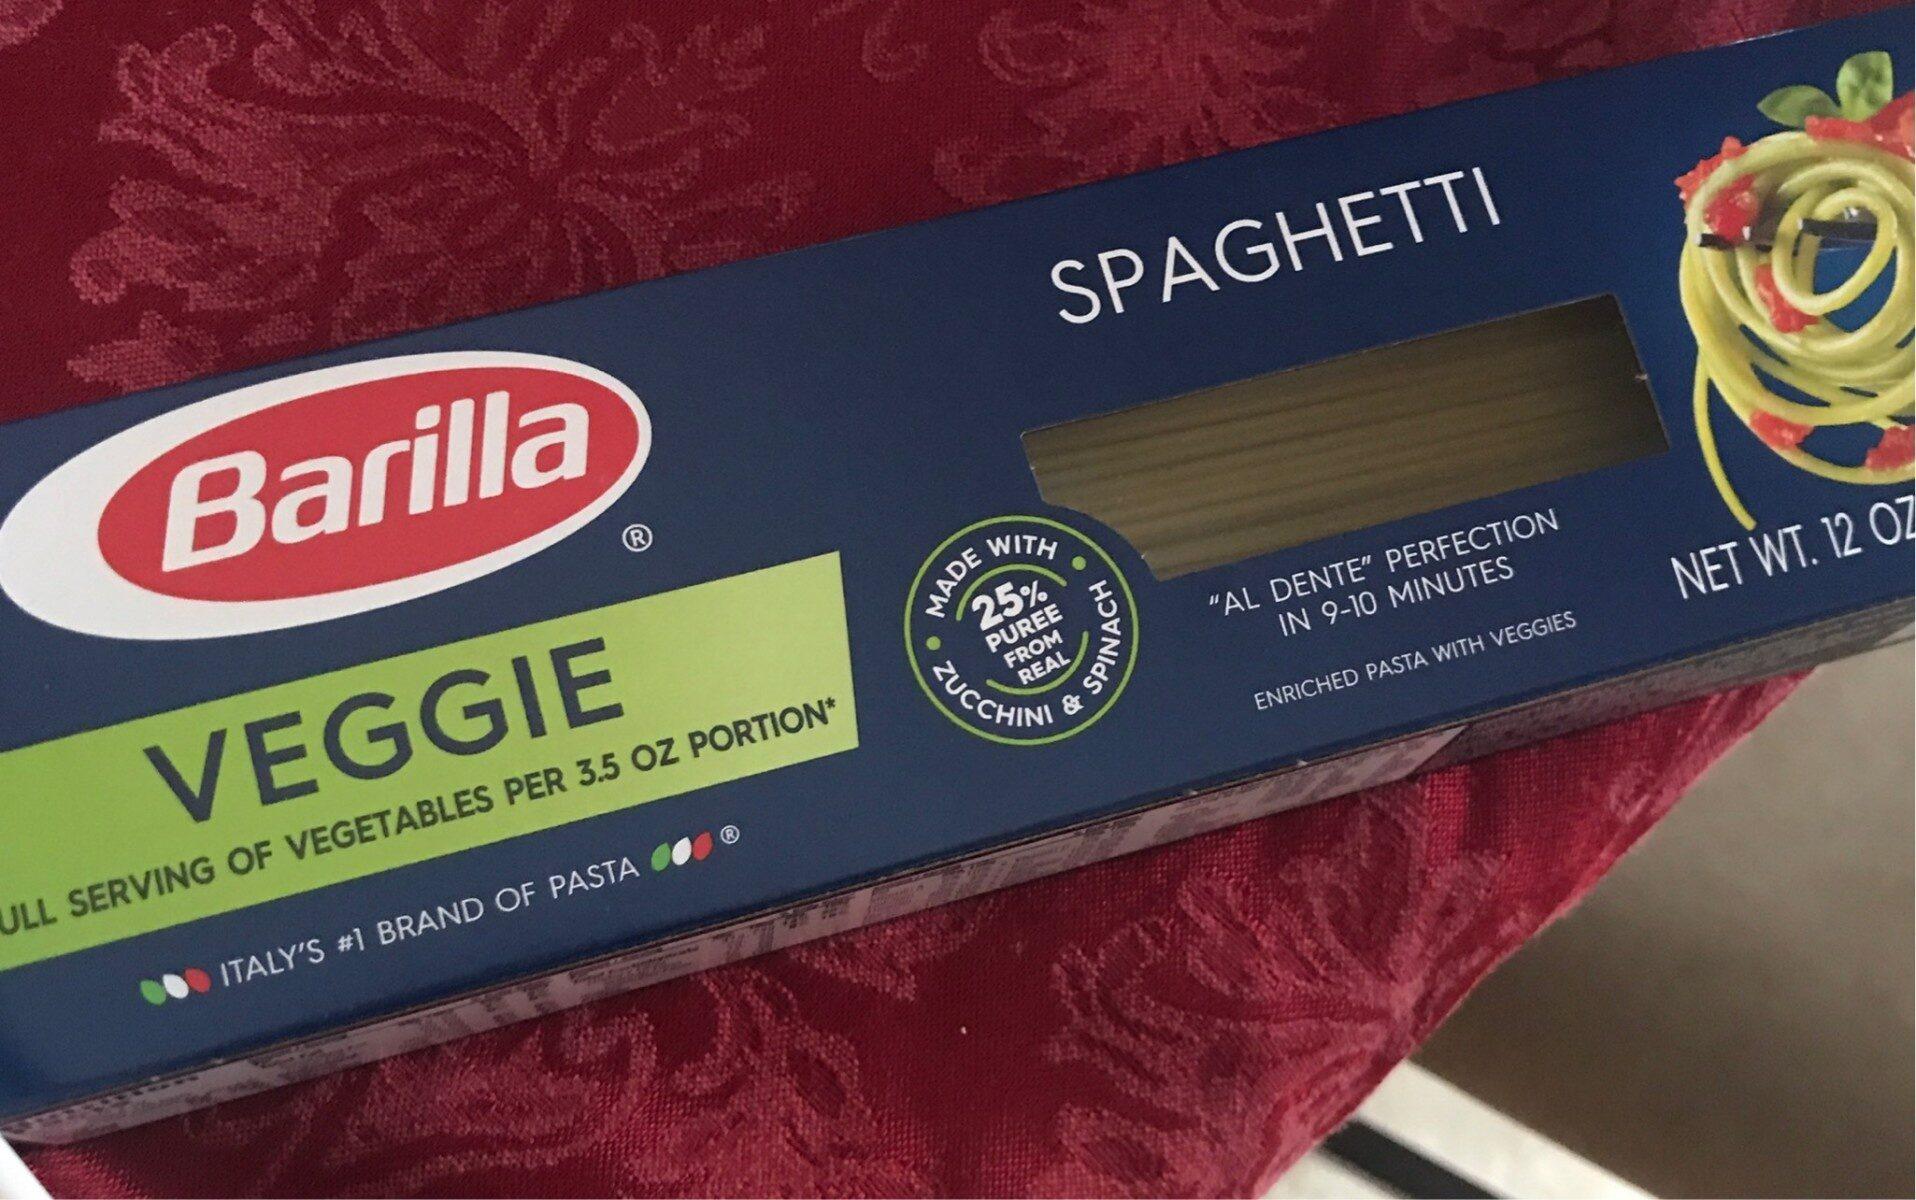 Spaghetti Veggie - Product